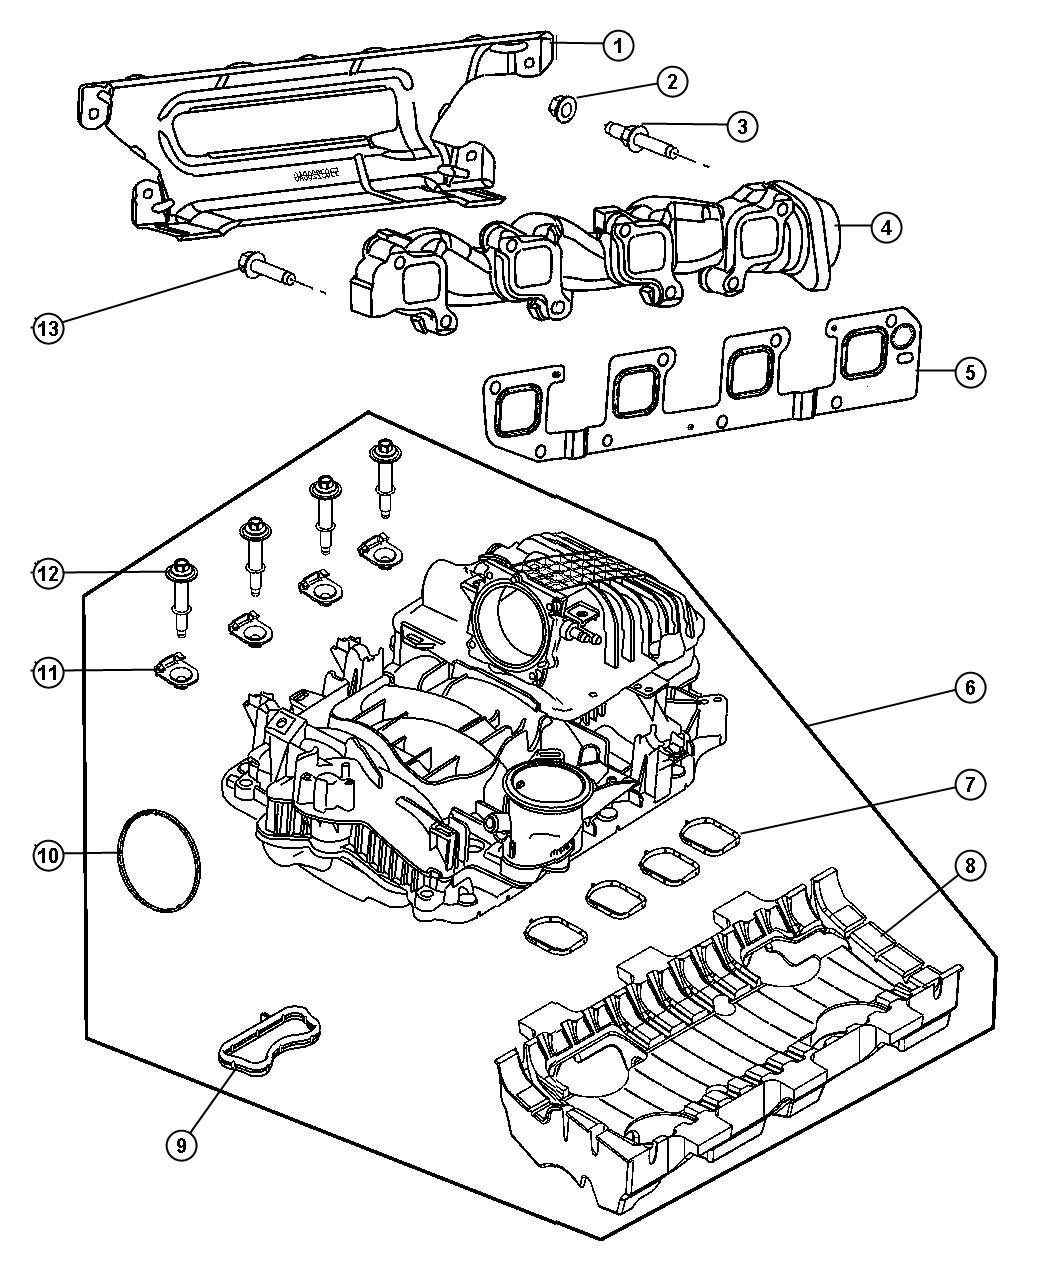 Dodge Ram Manifold Package Intake Engine